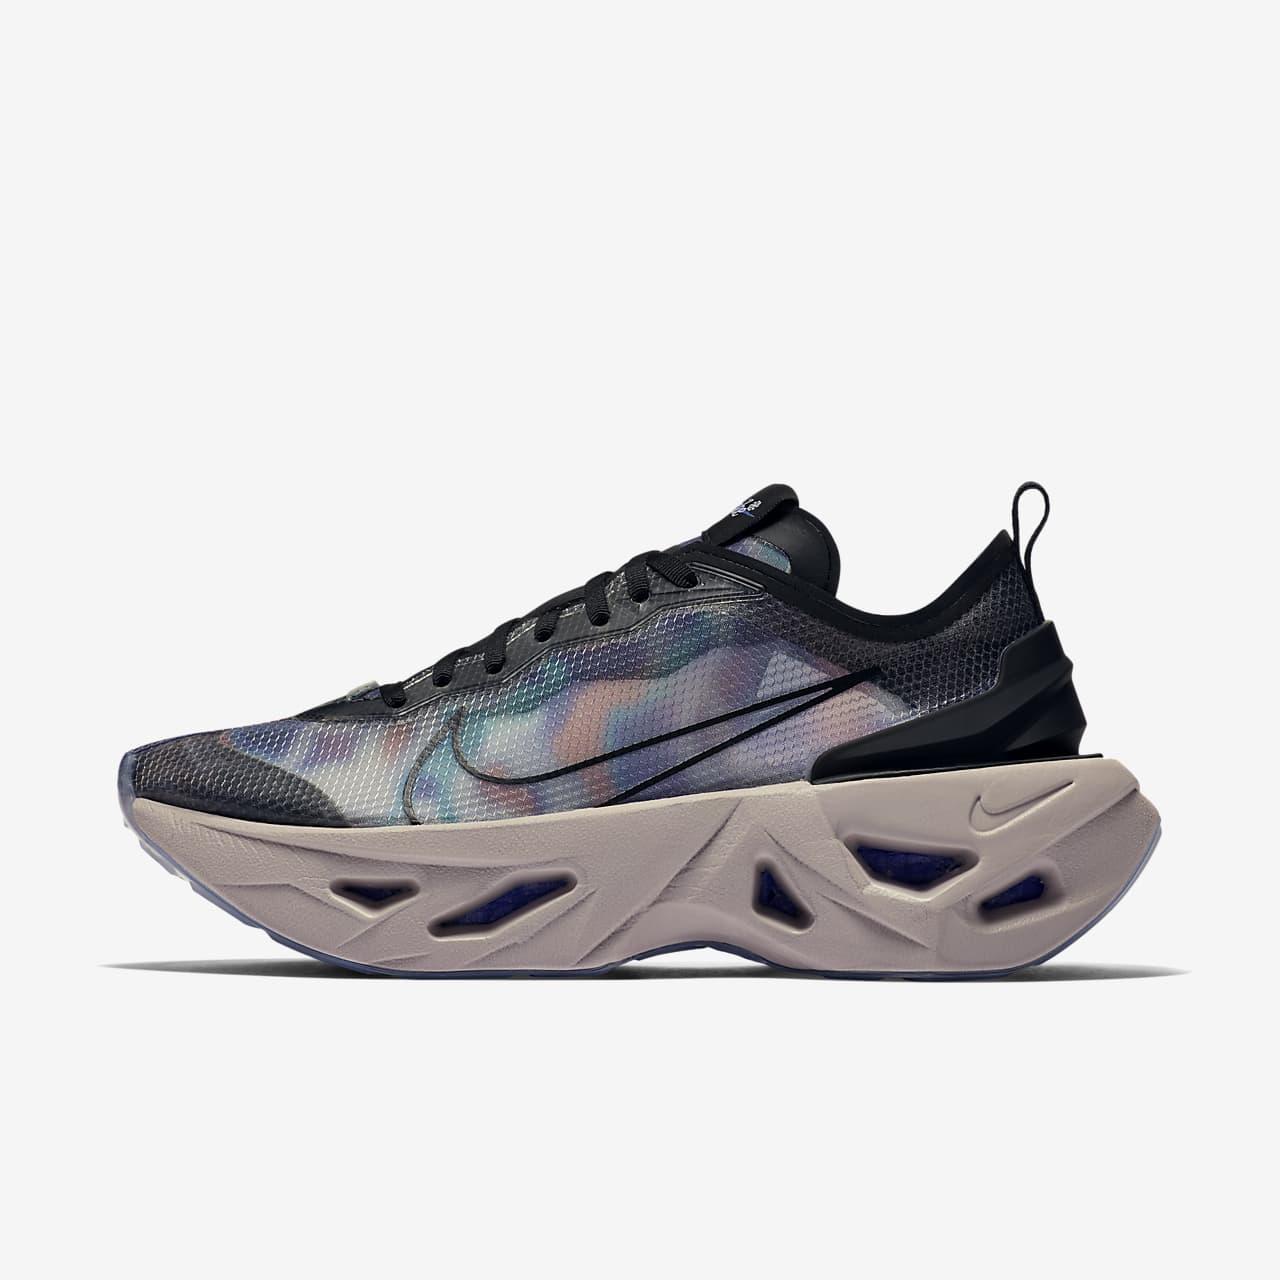 Nike ZoomX Vista Grind SP Women's Shoe